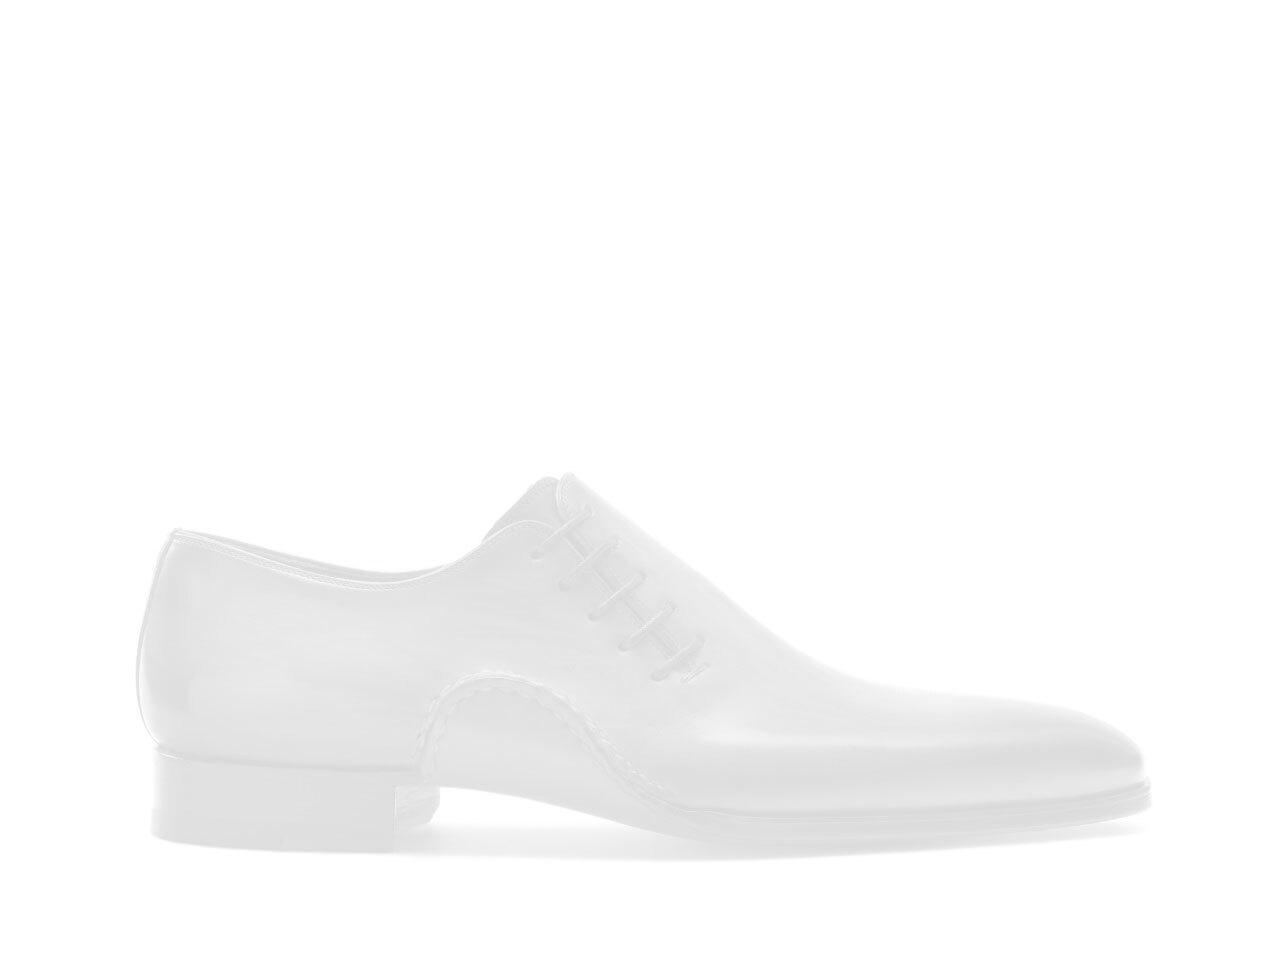 Pair of the Magnanni Fisterra Cognac Men's Tassel Loafers